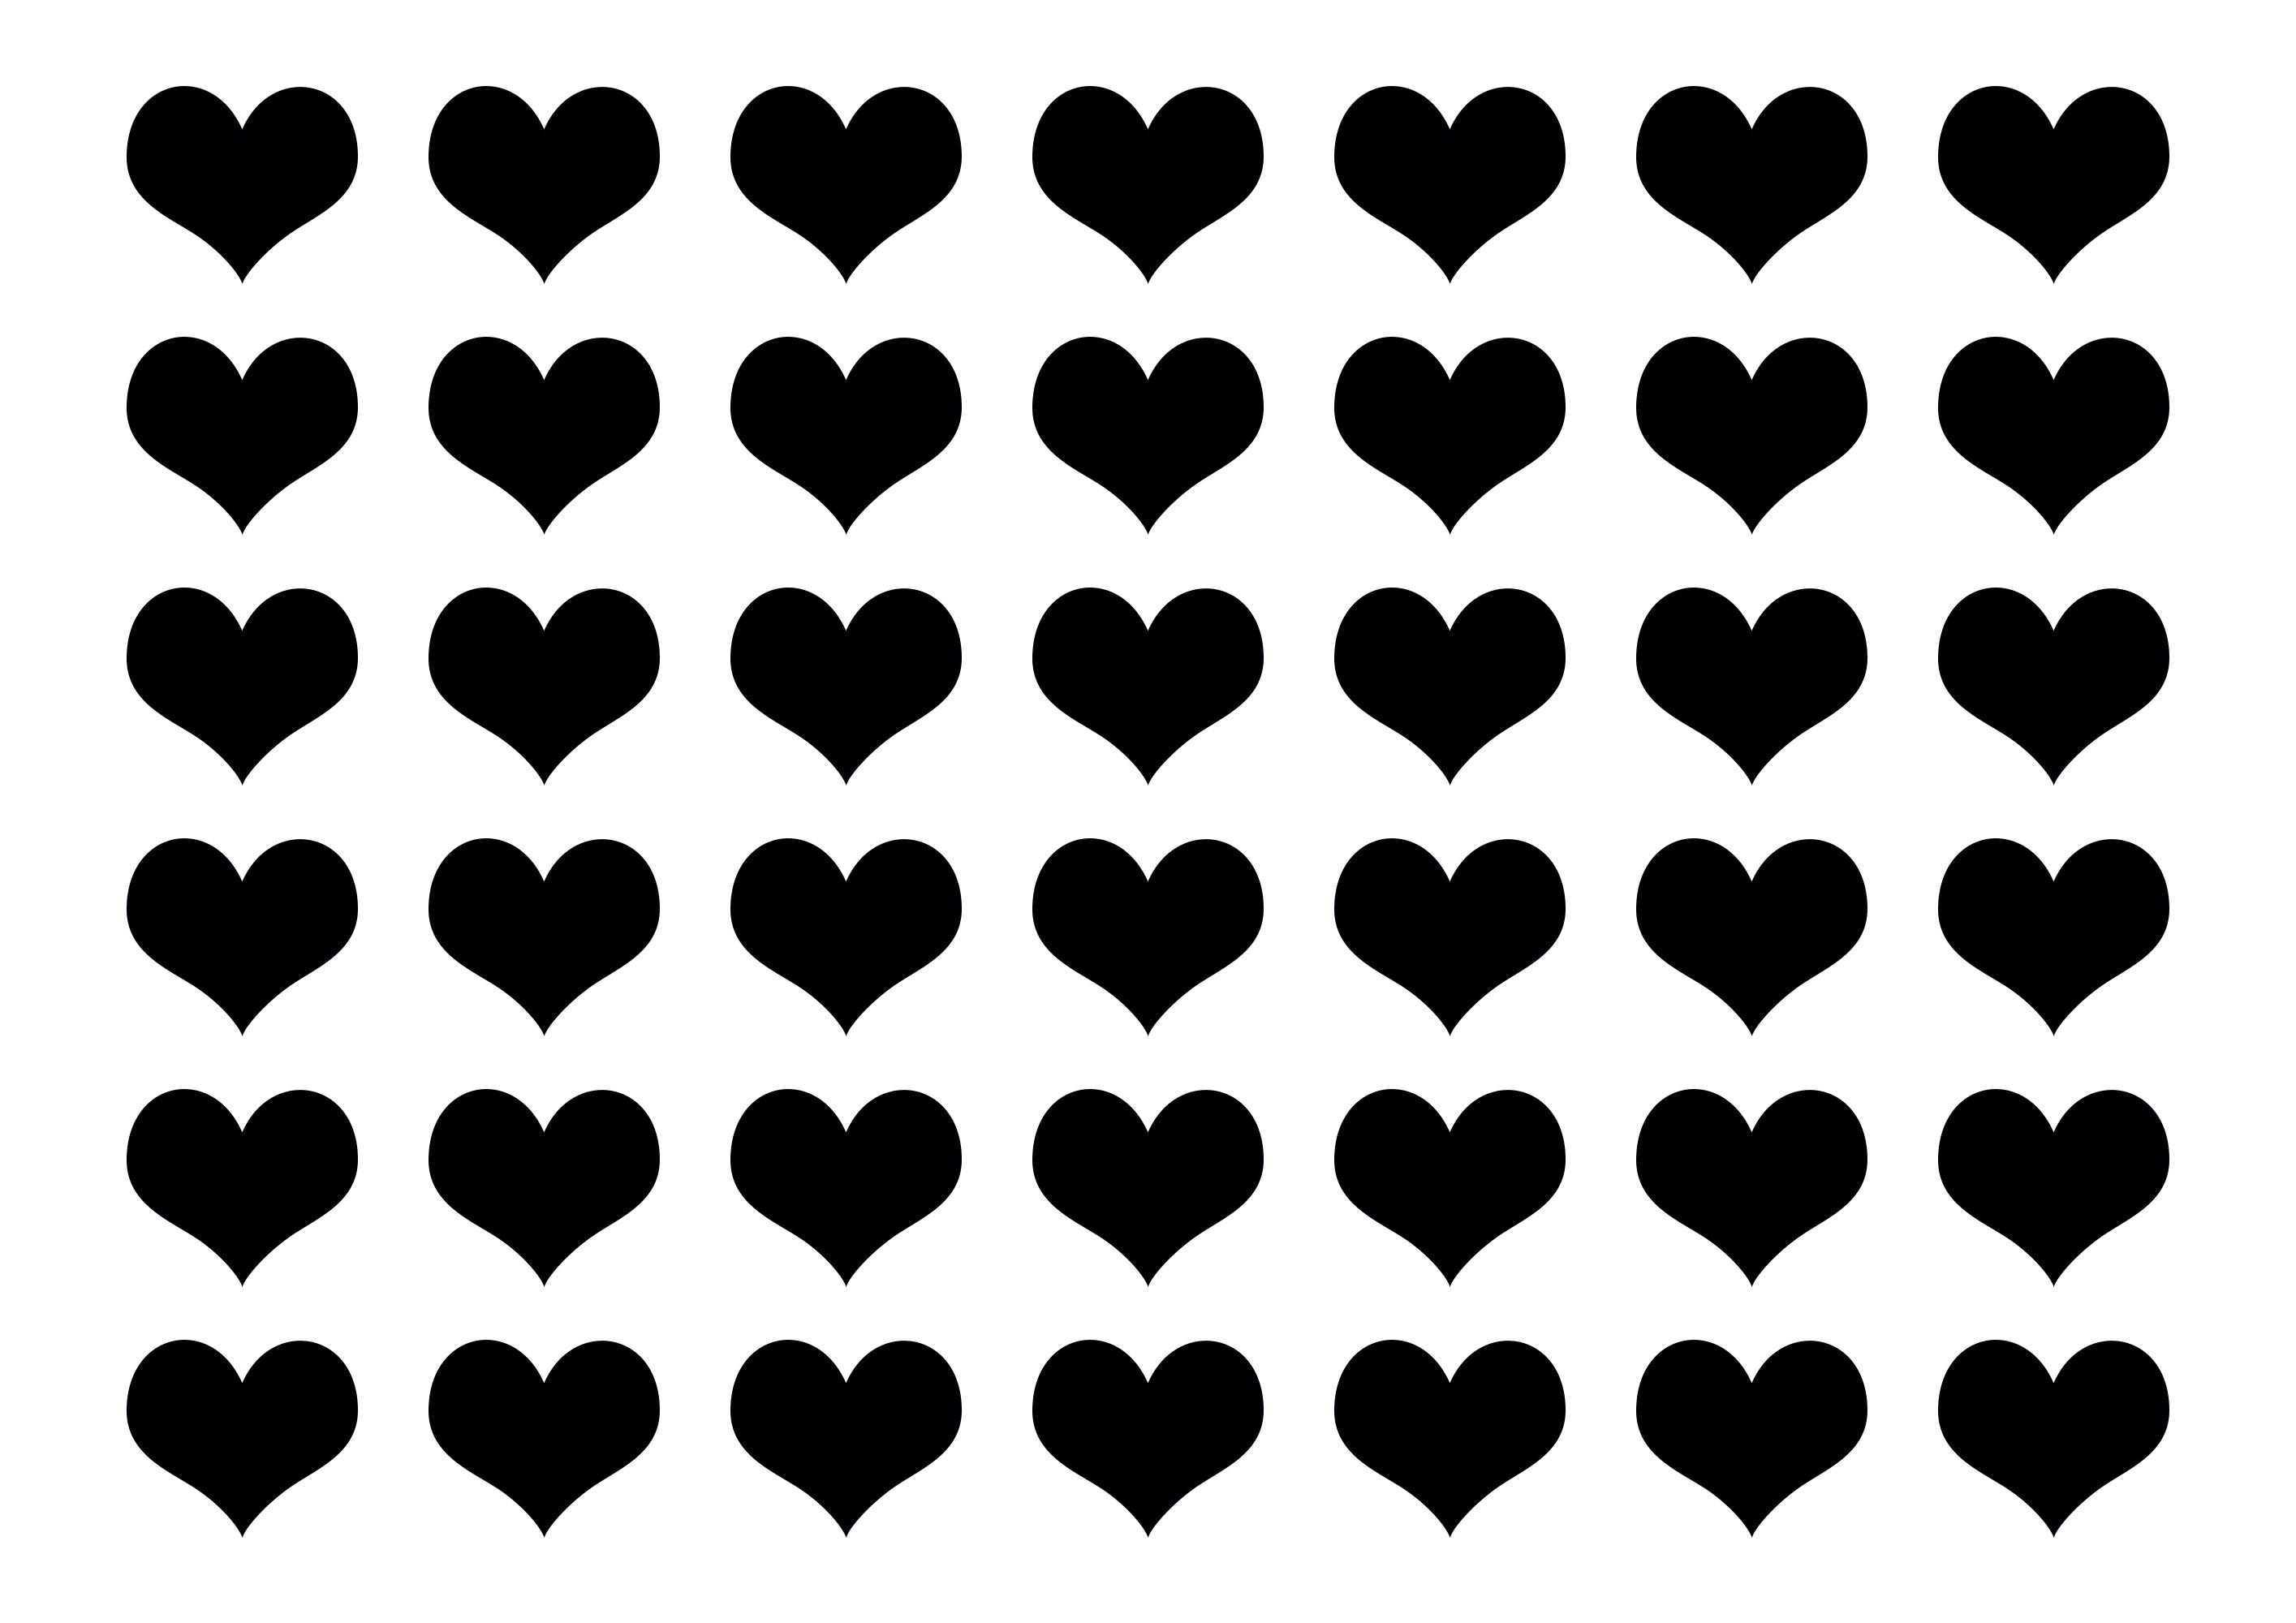 Free Printable Heart Templates (Small) – Olivia Adorf - Free Printable Heart Templates